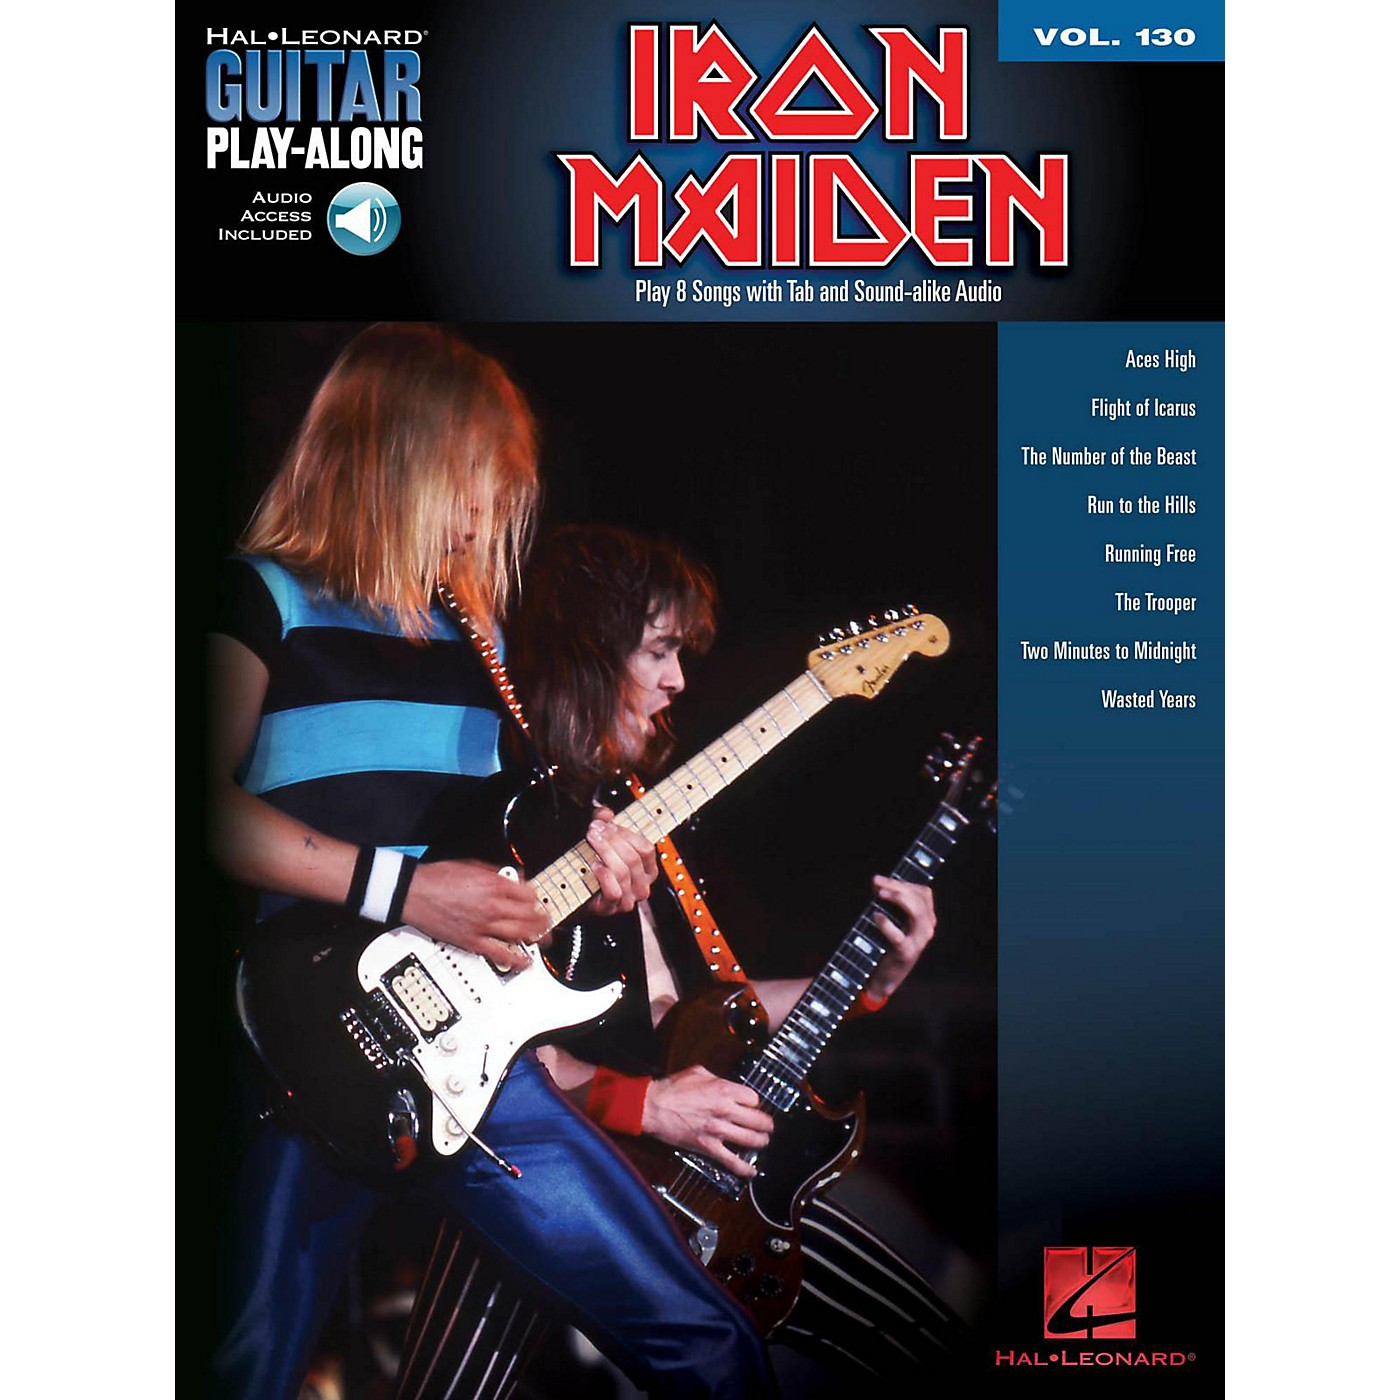 Hal Leonard Iron Maiden - Guitar Play-Along Volume 130 (Book/Online Audio) thumbnail